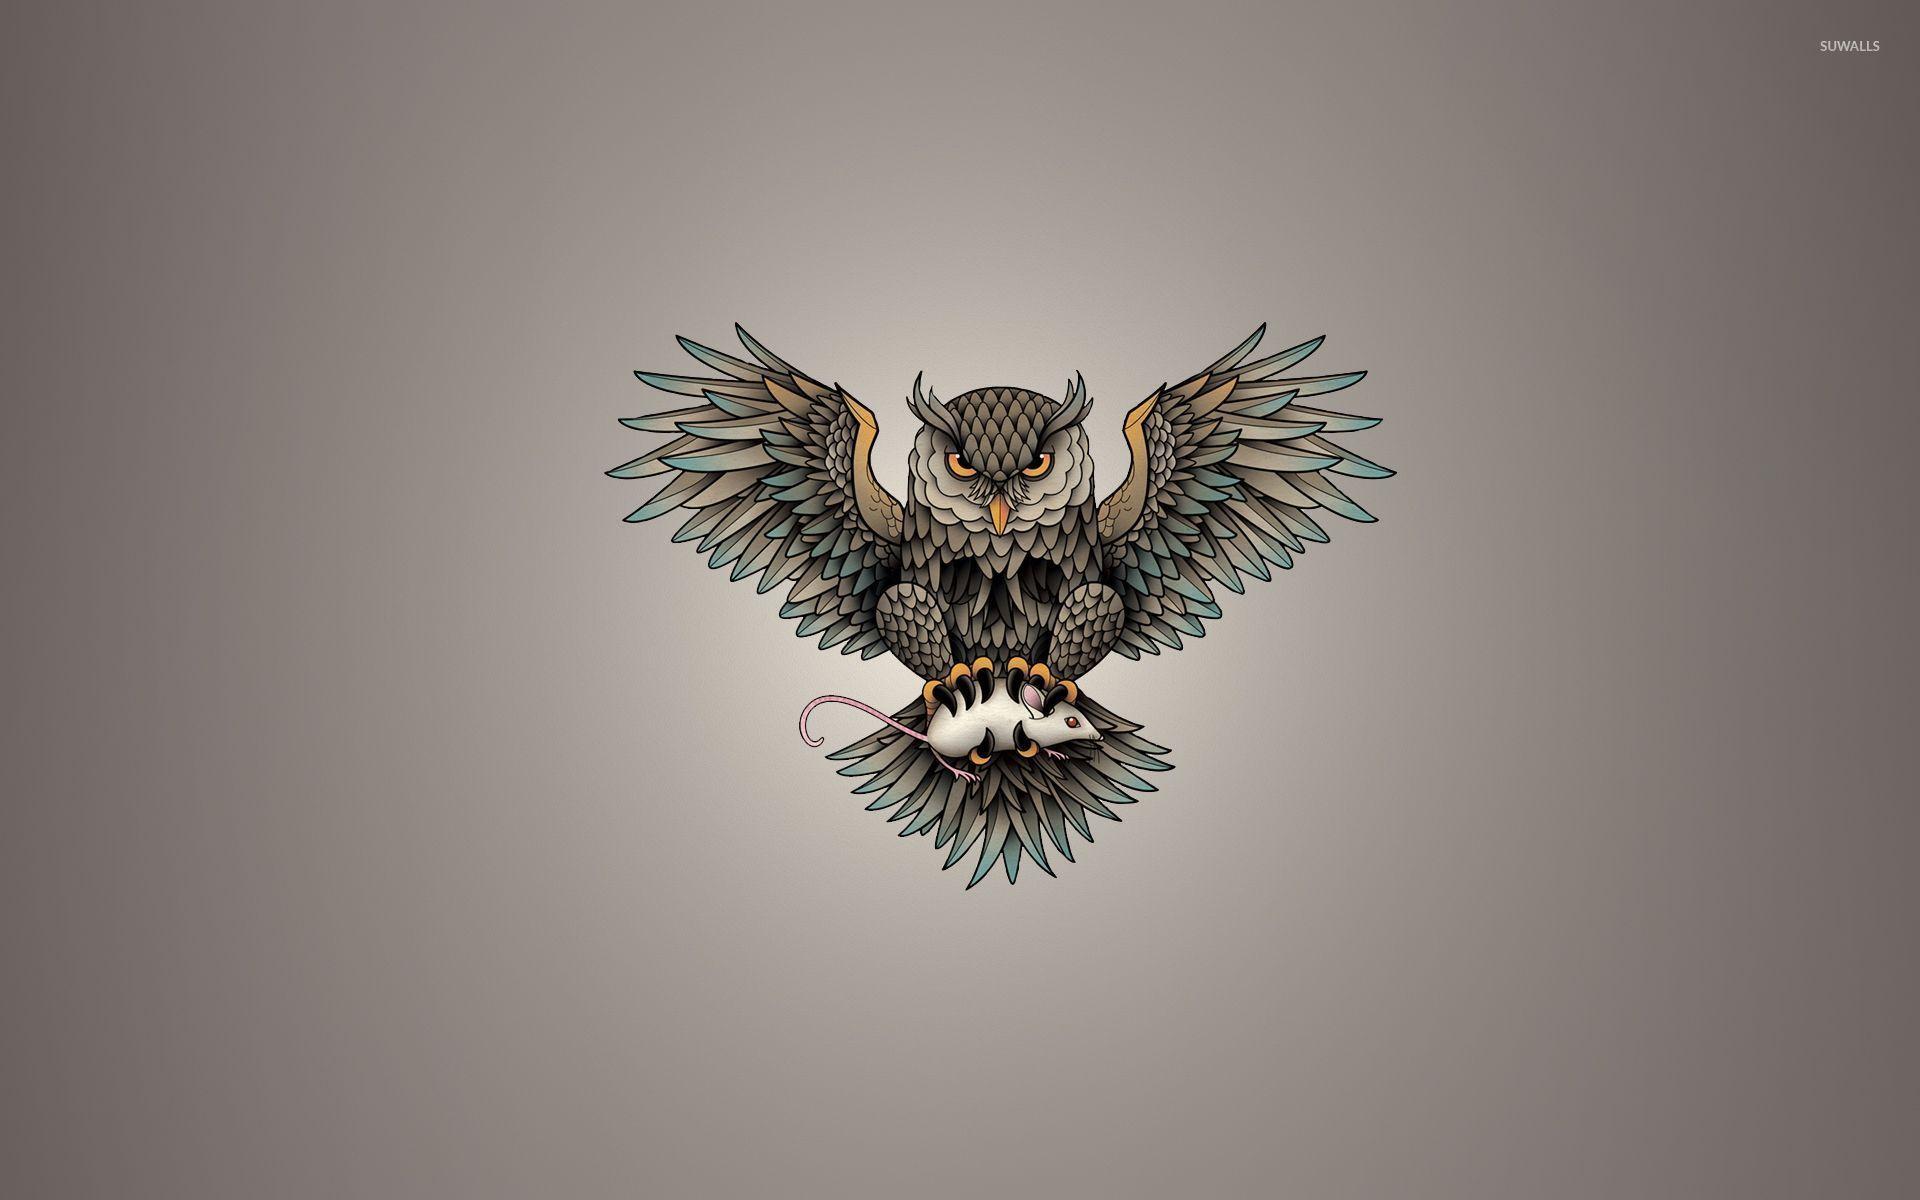 Owl Hd Wallpapers Digital Art ...